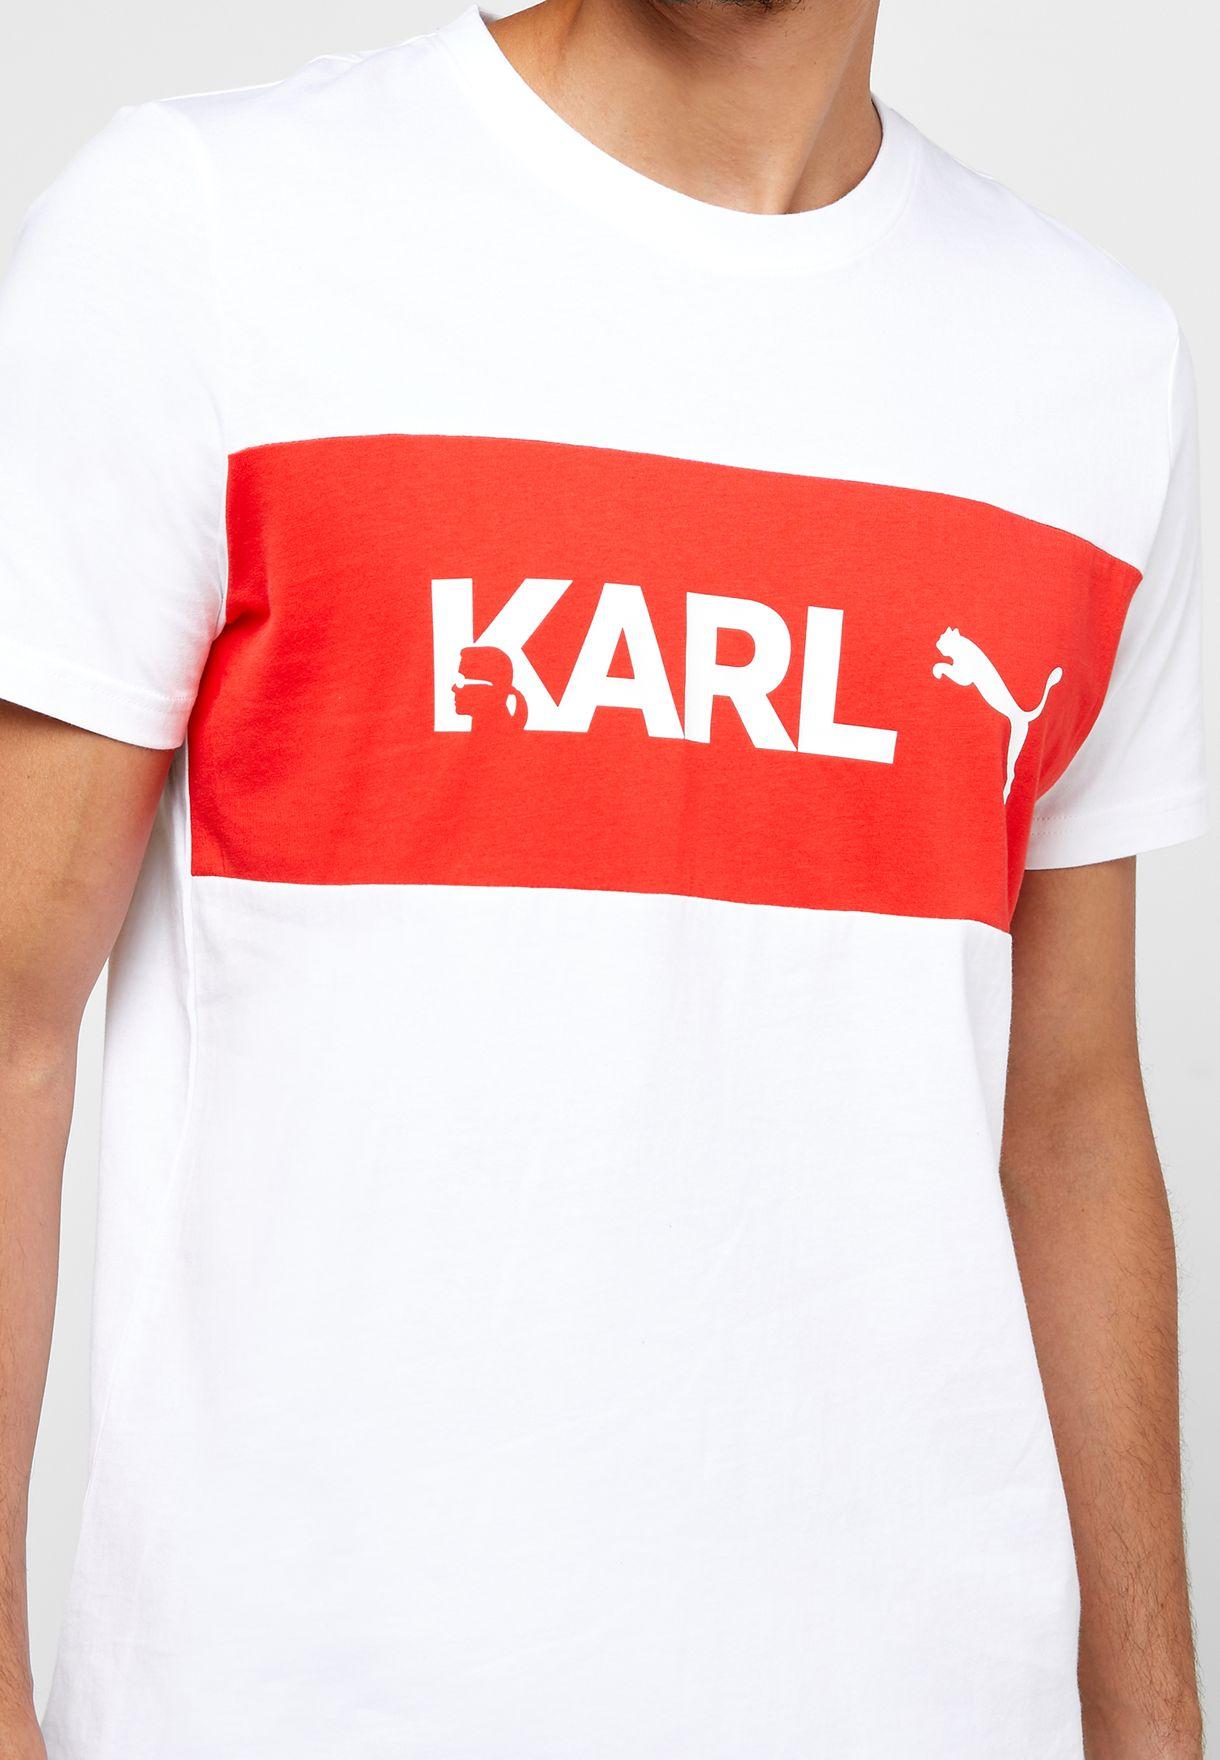 Karl T-Shirt